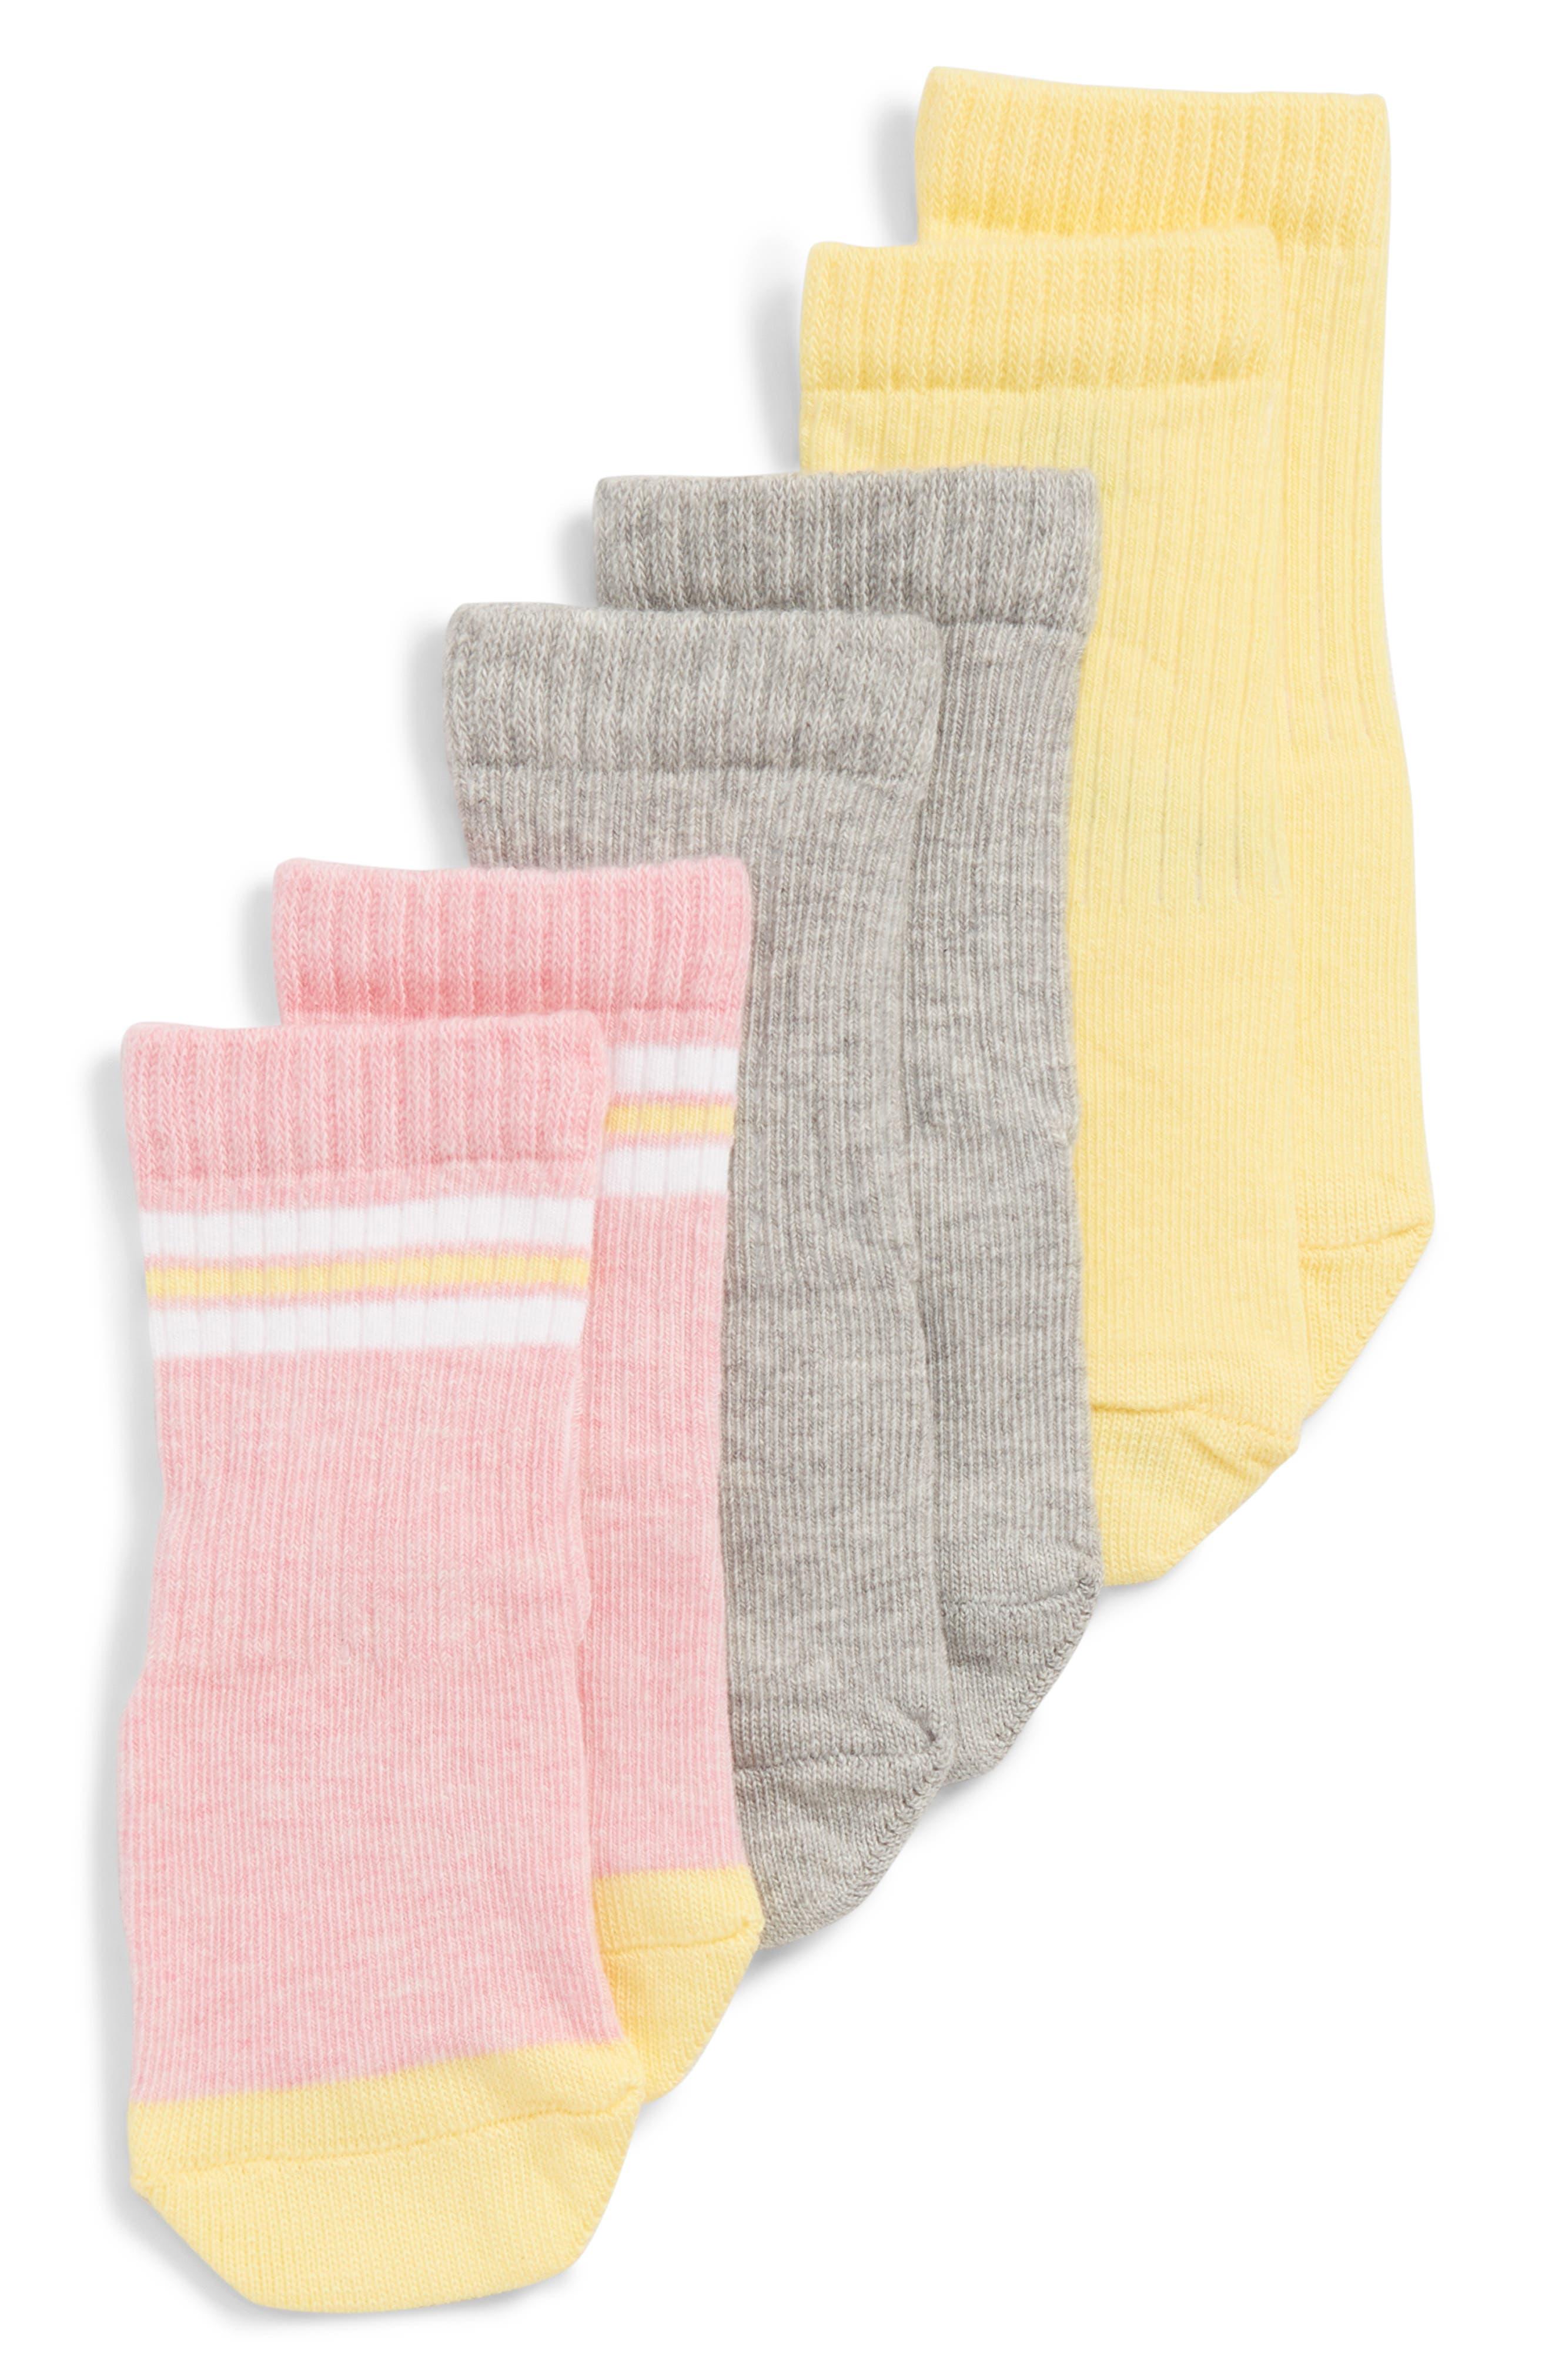 Smile 3-Pack Crew Socks,                             Main thumbnail 1, color,                             YELLOW MULTI